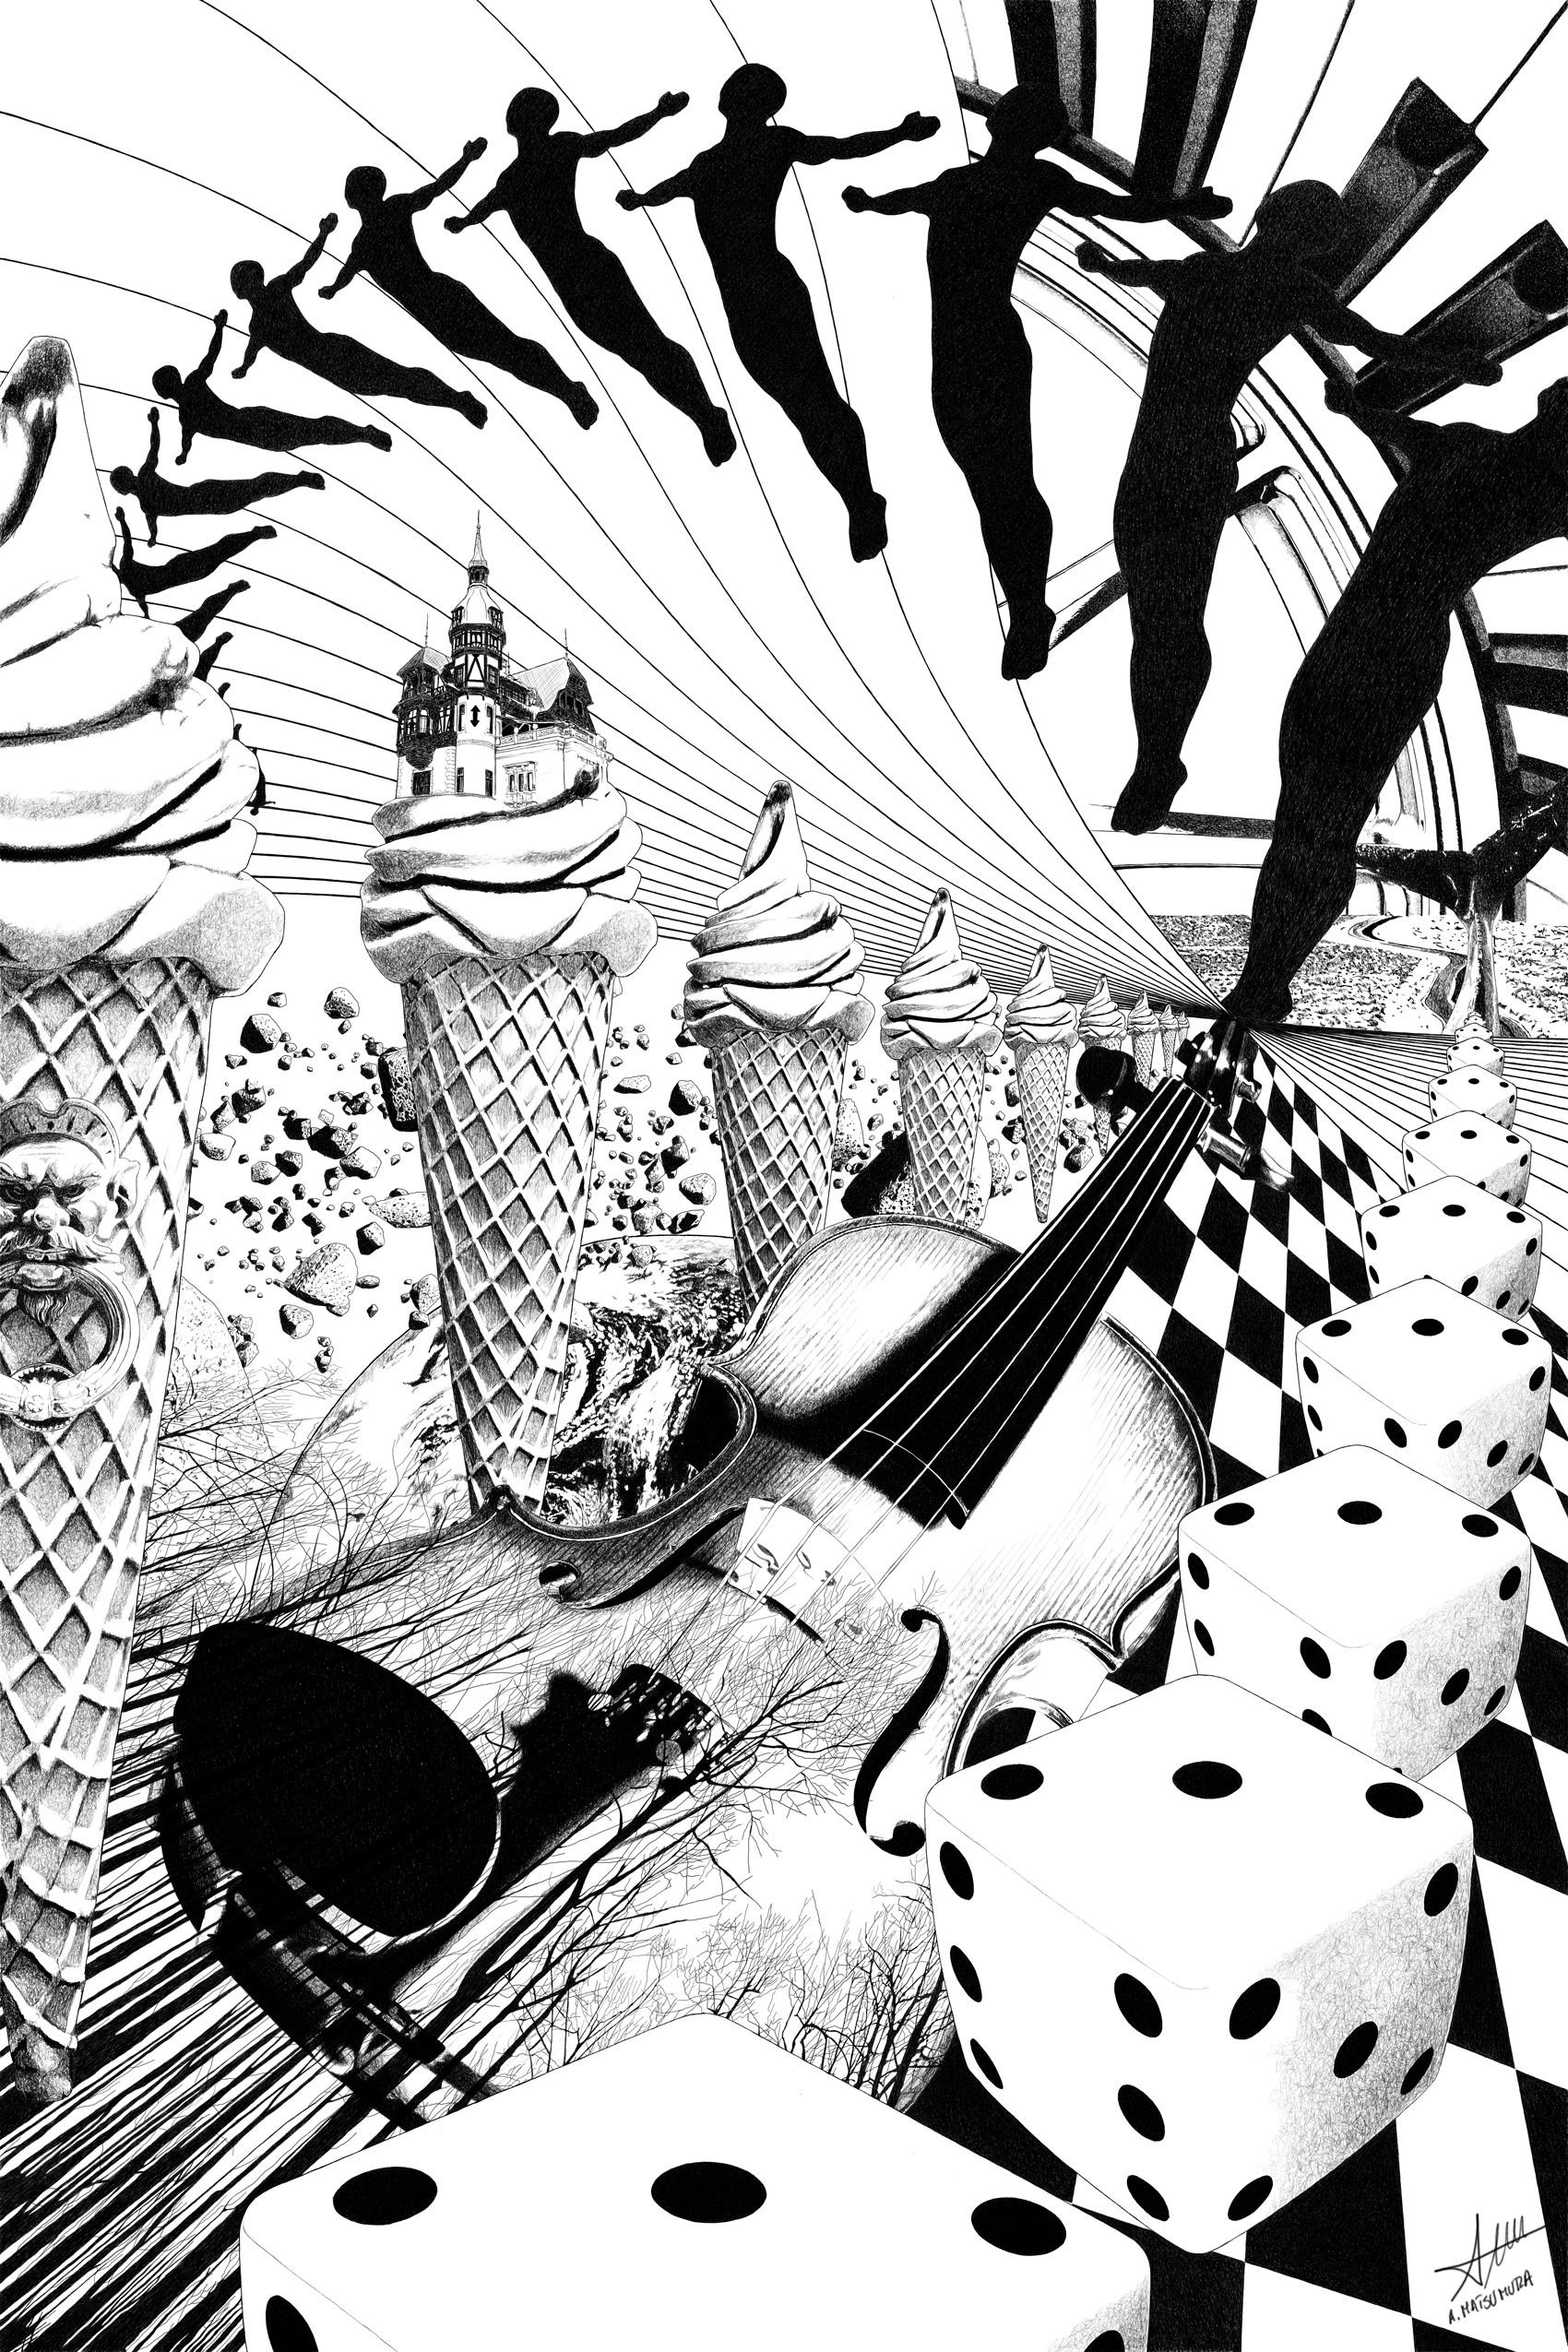 CONTACT PLANET EARTH - surrealism - alberto_matsumura   ello